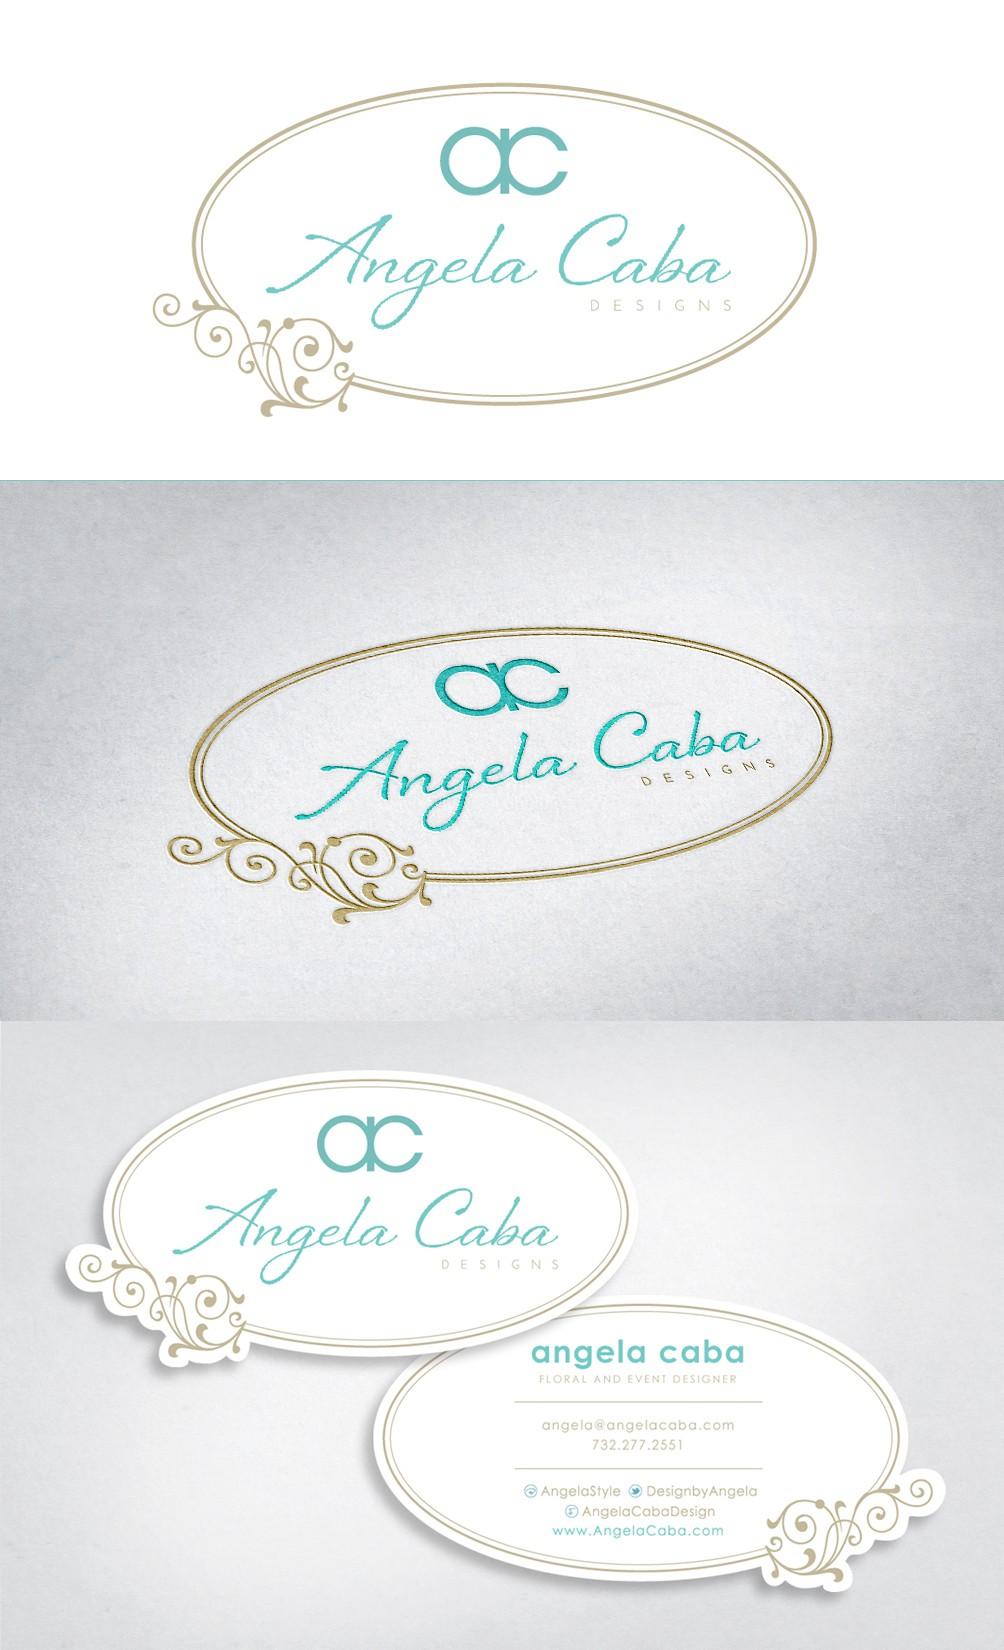 logo and business card for Angela Caba Design